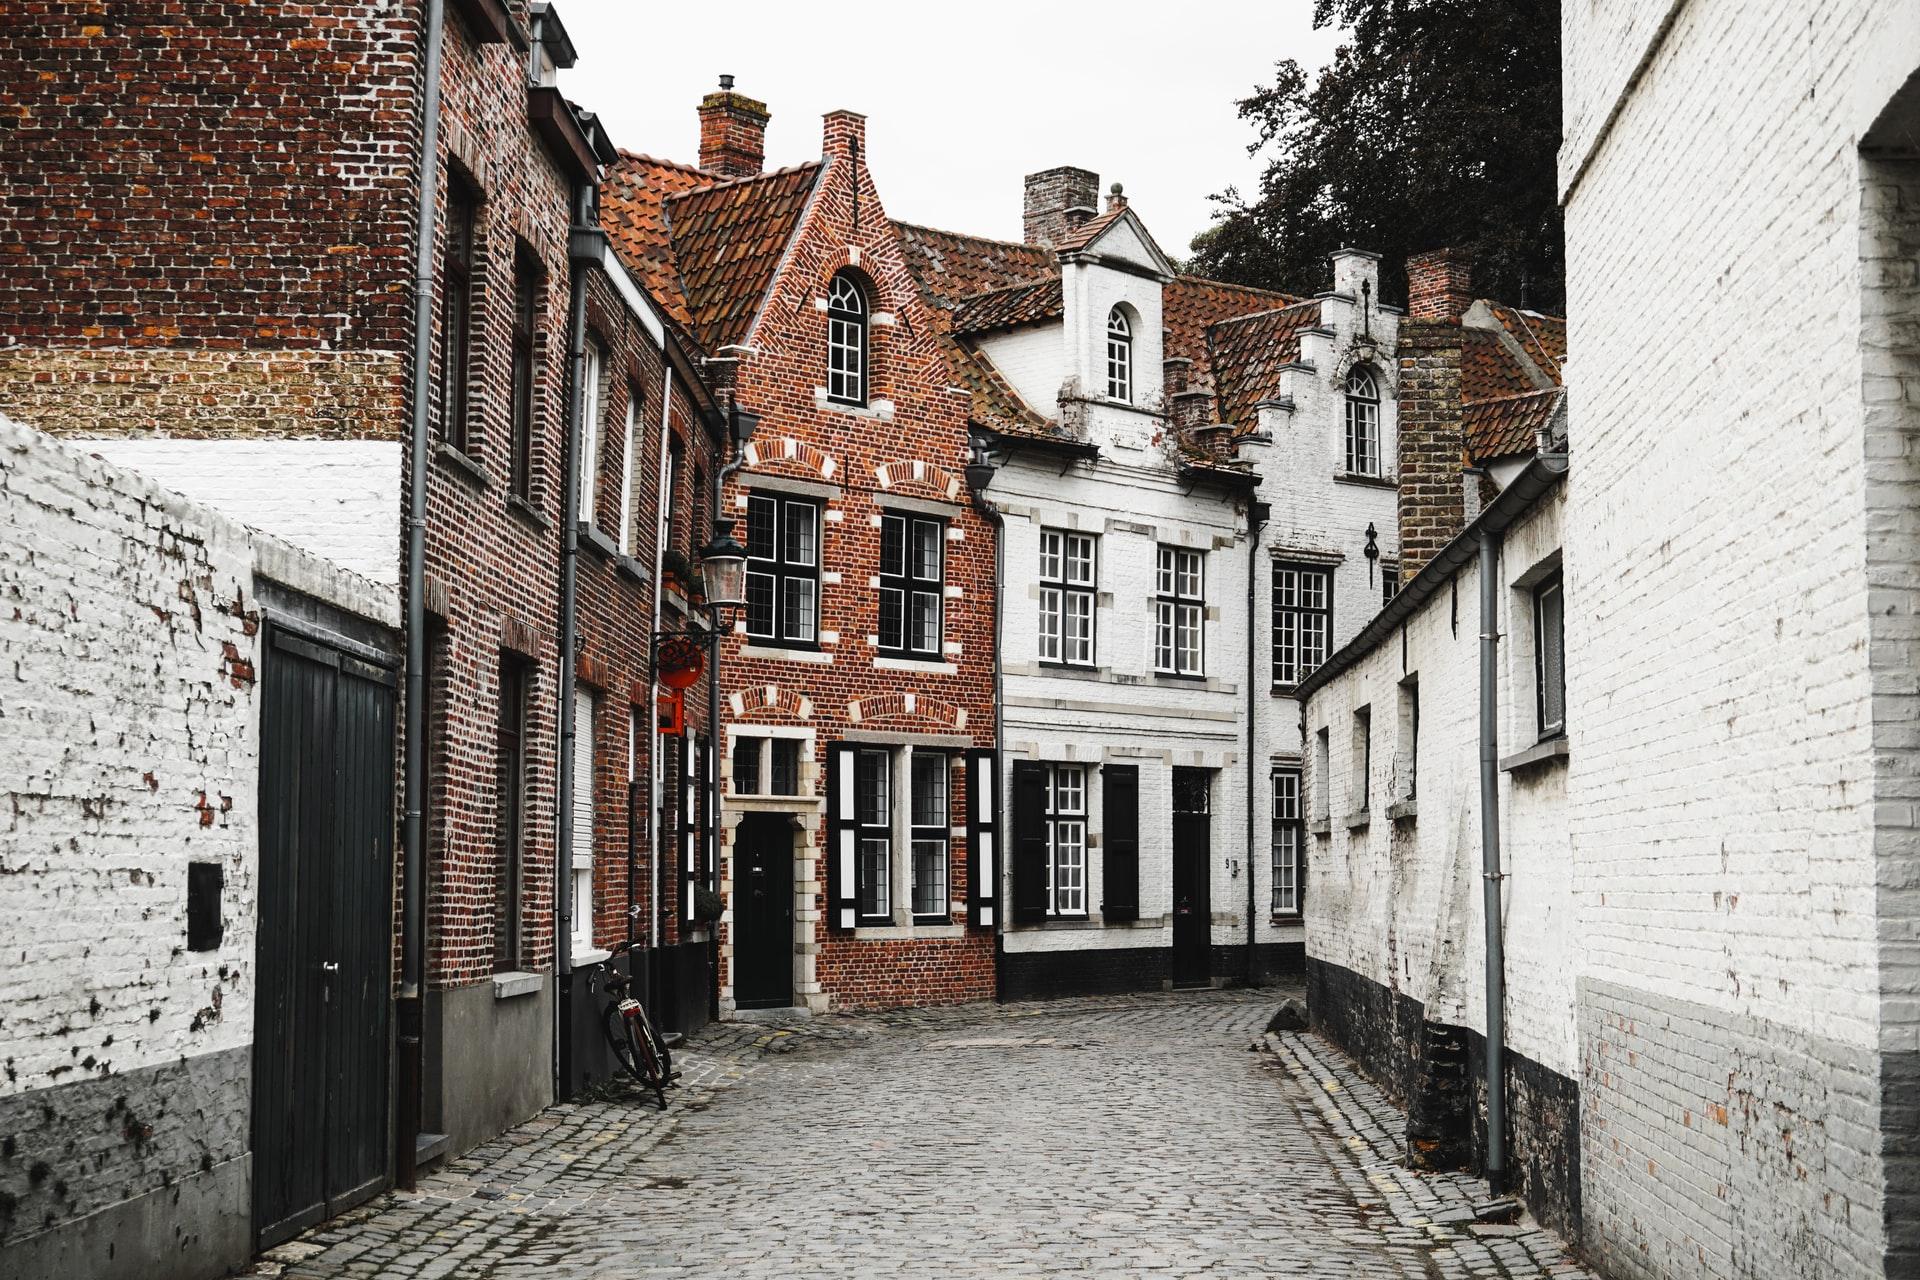 Houses in Bruges Belgium